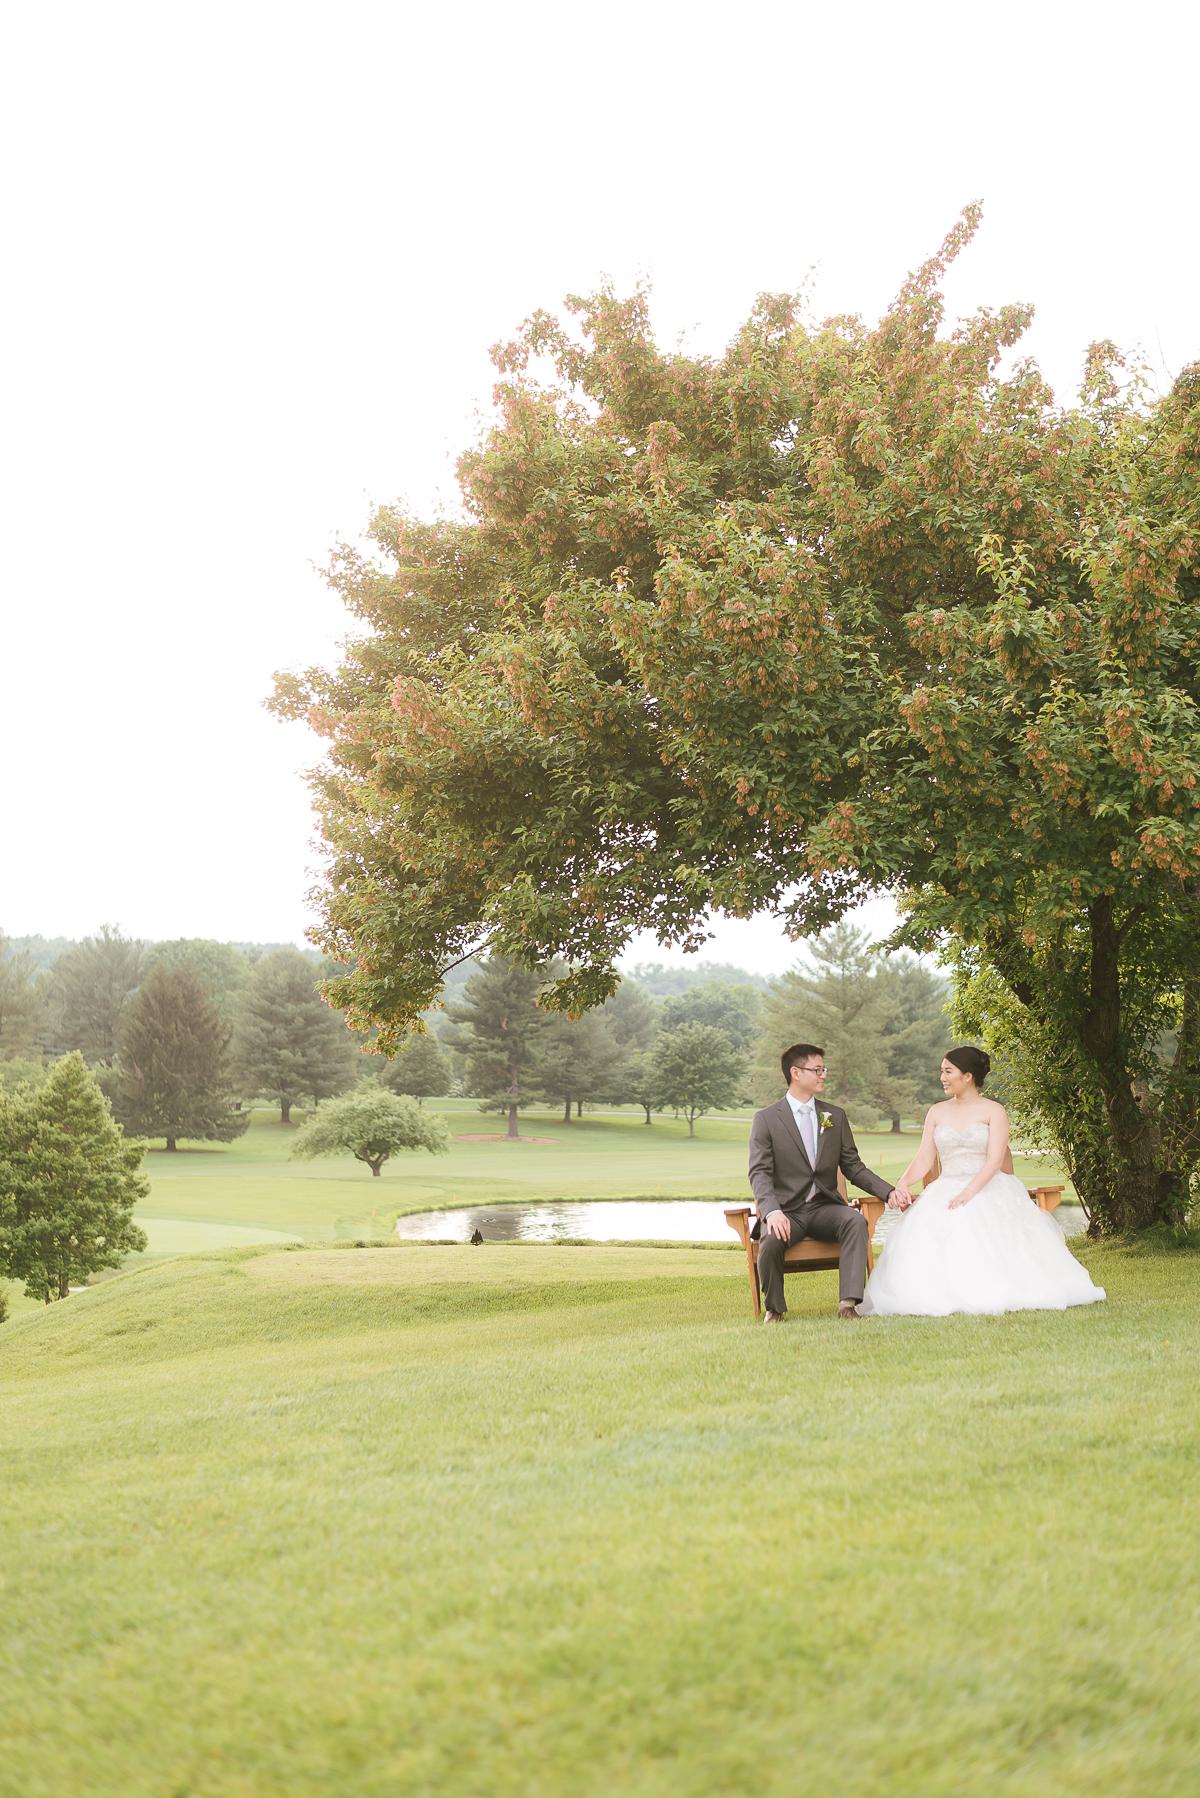 MD-Wedding-Bretton-Woods-Bride-Groom-Portraits-29.jpg